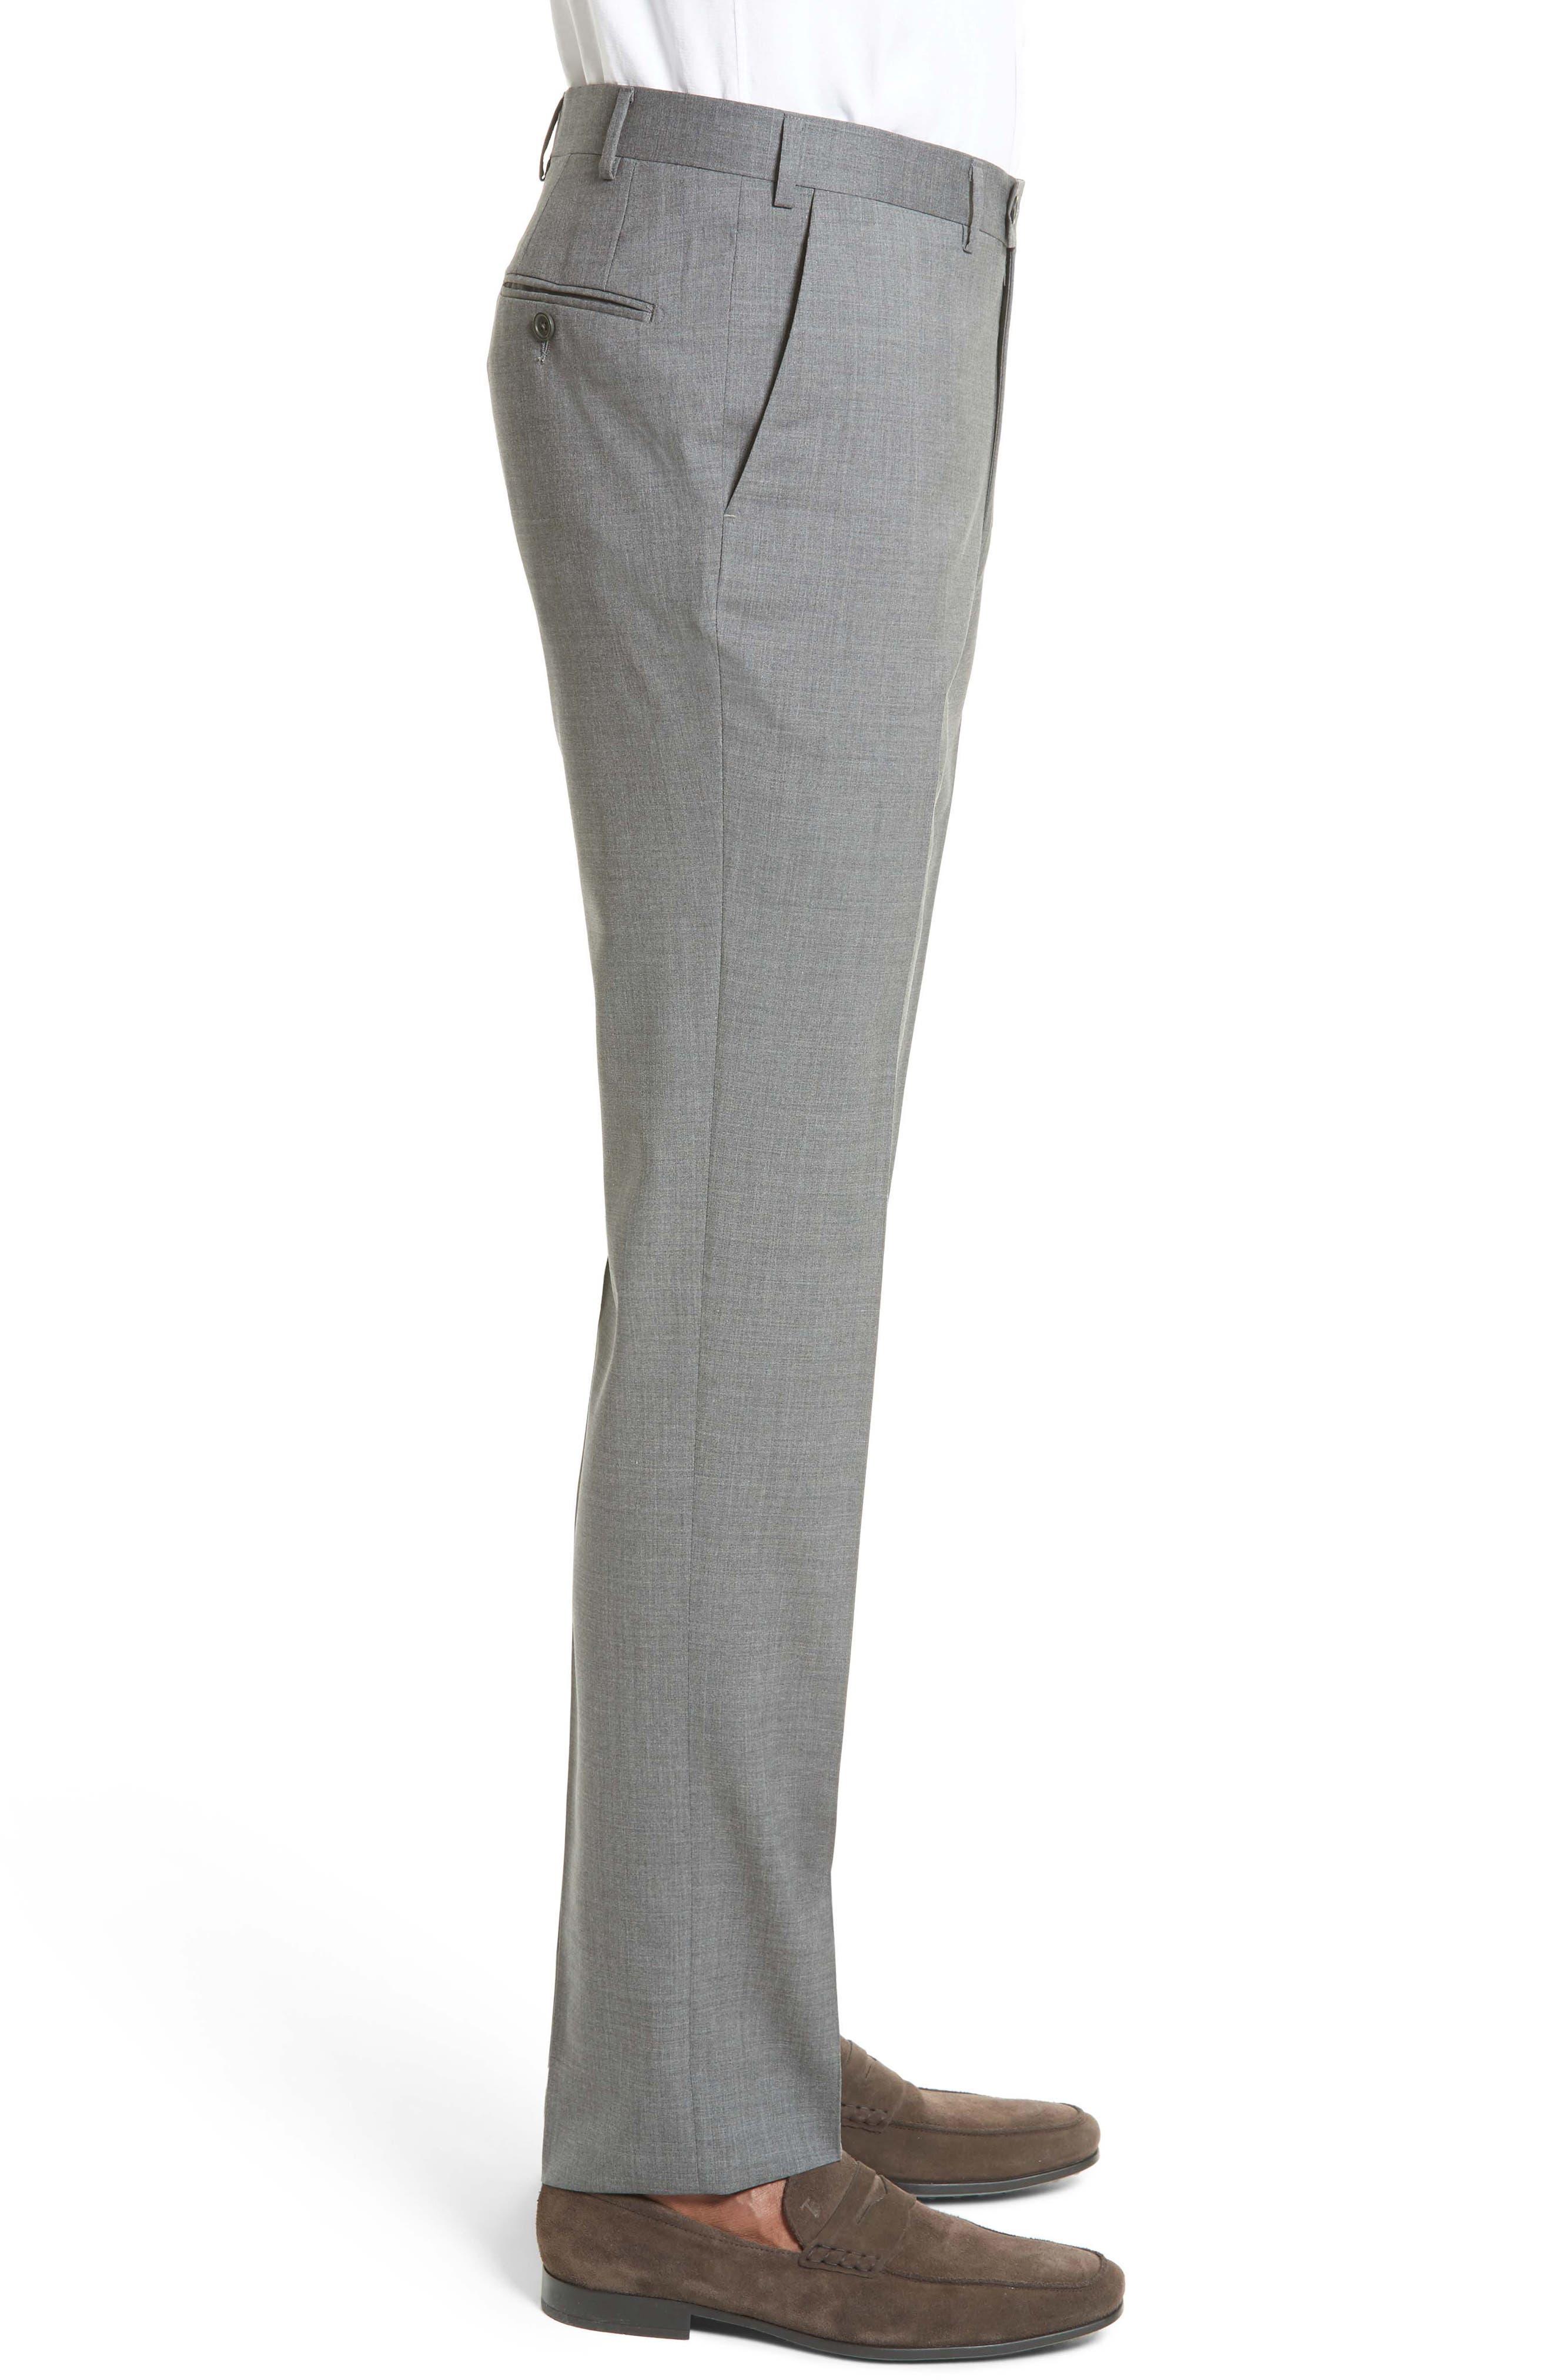 Tropical Wool Suit Trousers,                             Alternate thumbnail 3, color,                             020